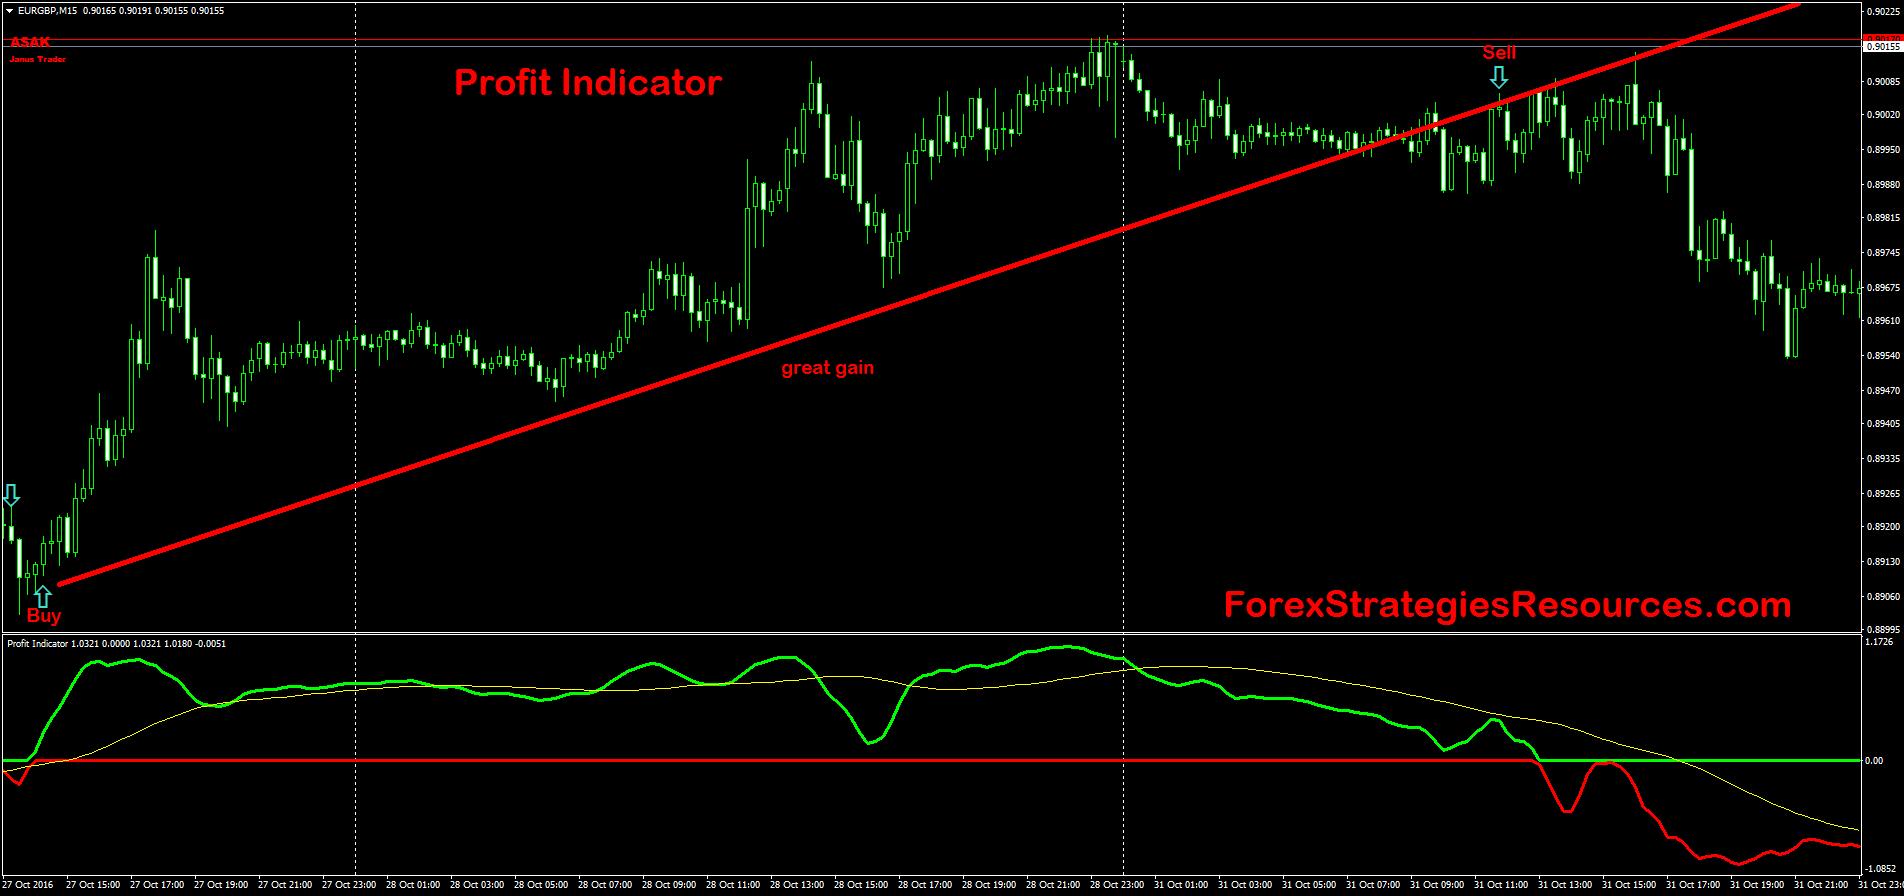 Profit Indicator - Forex Strategies - Forex Resources - Forex